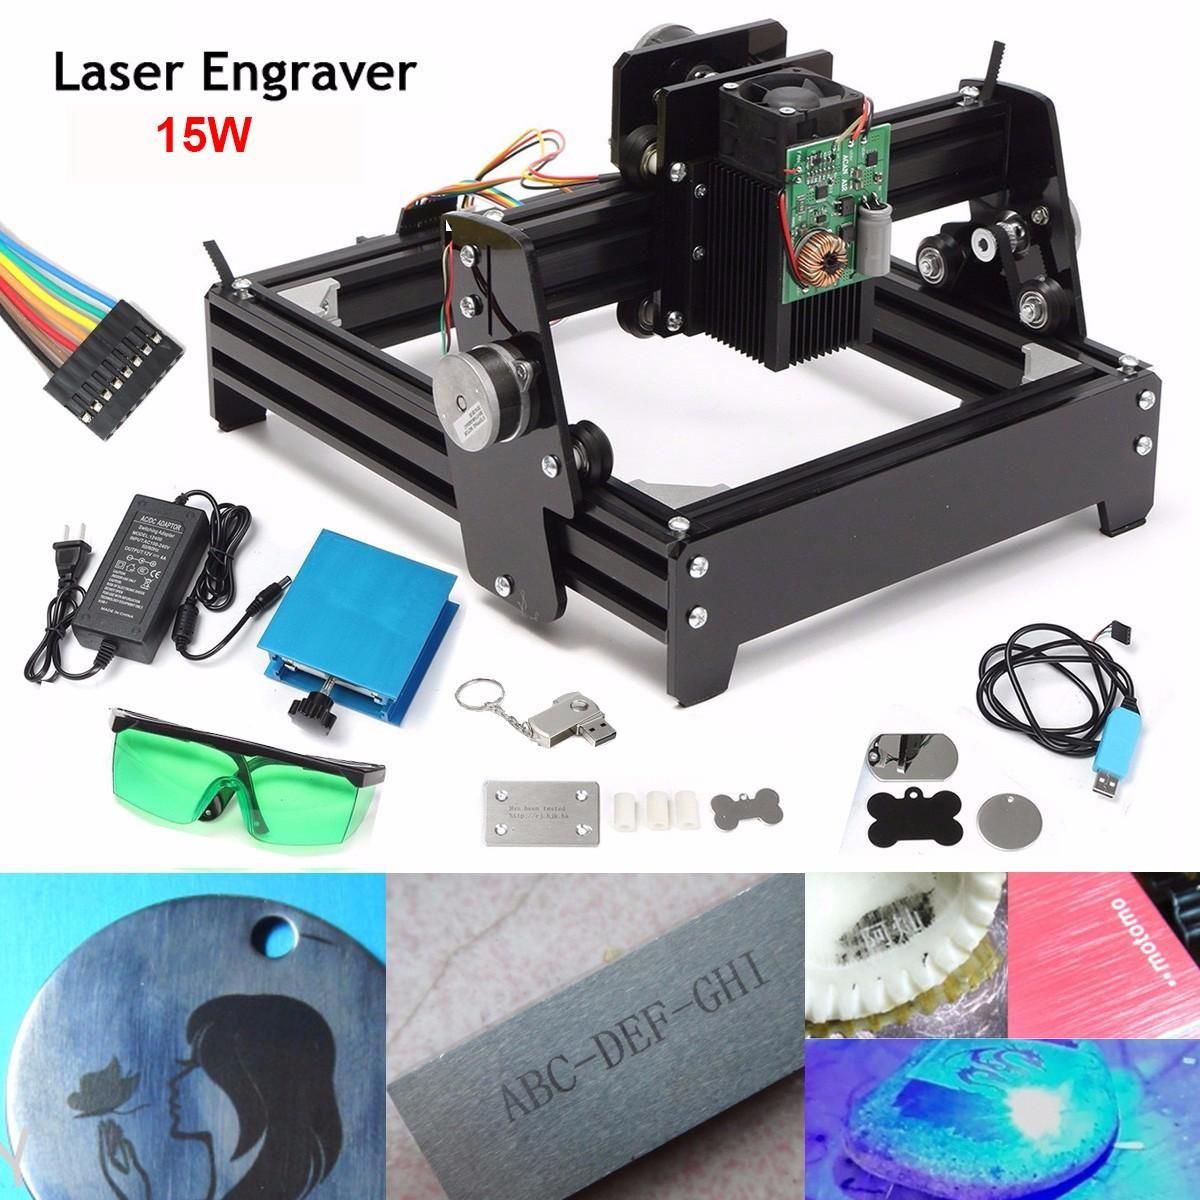 New 15W Laser AS-5 USB Desktop 15000mW CNC Laser Engraver DIY Marking Machine For Metal Stone Wood Engraving Area 14 x 20cm